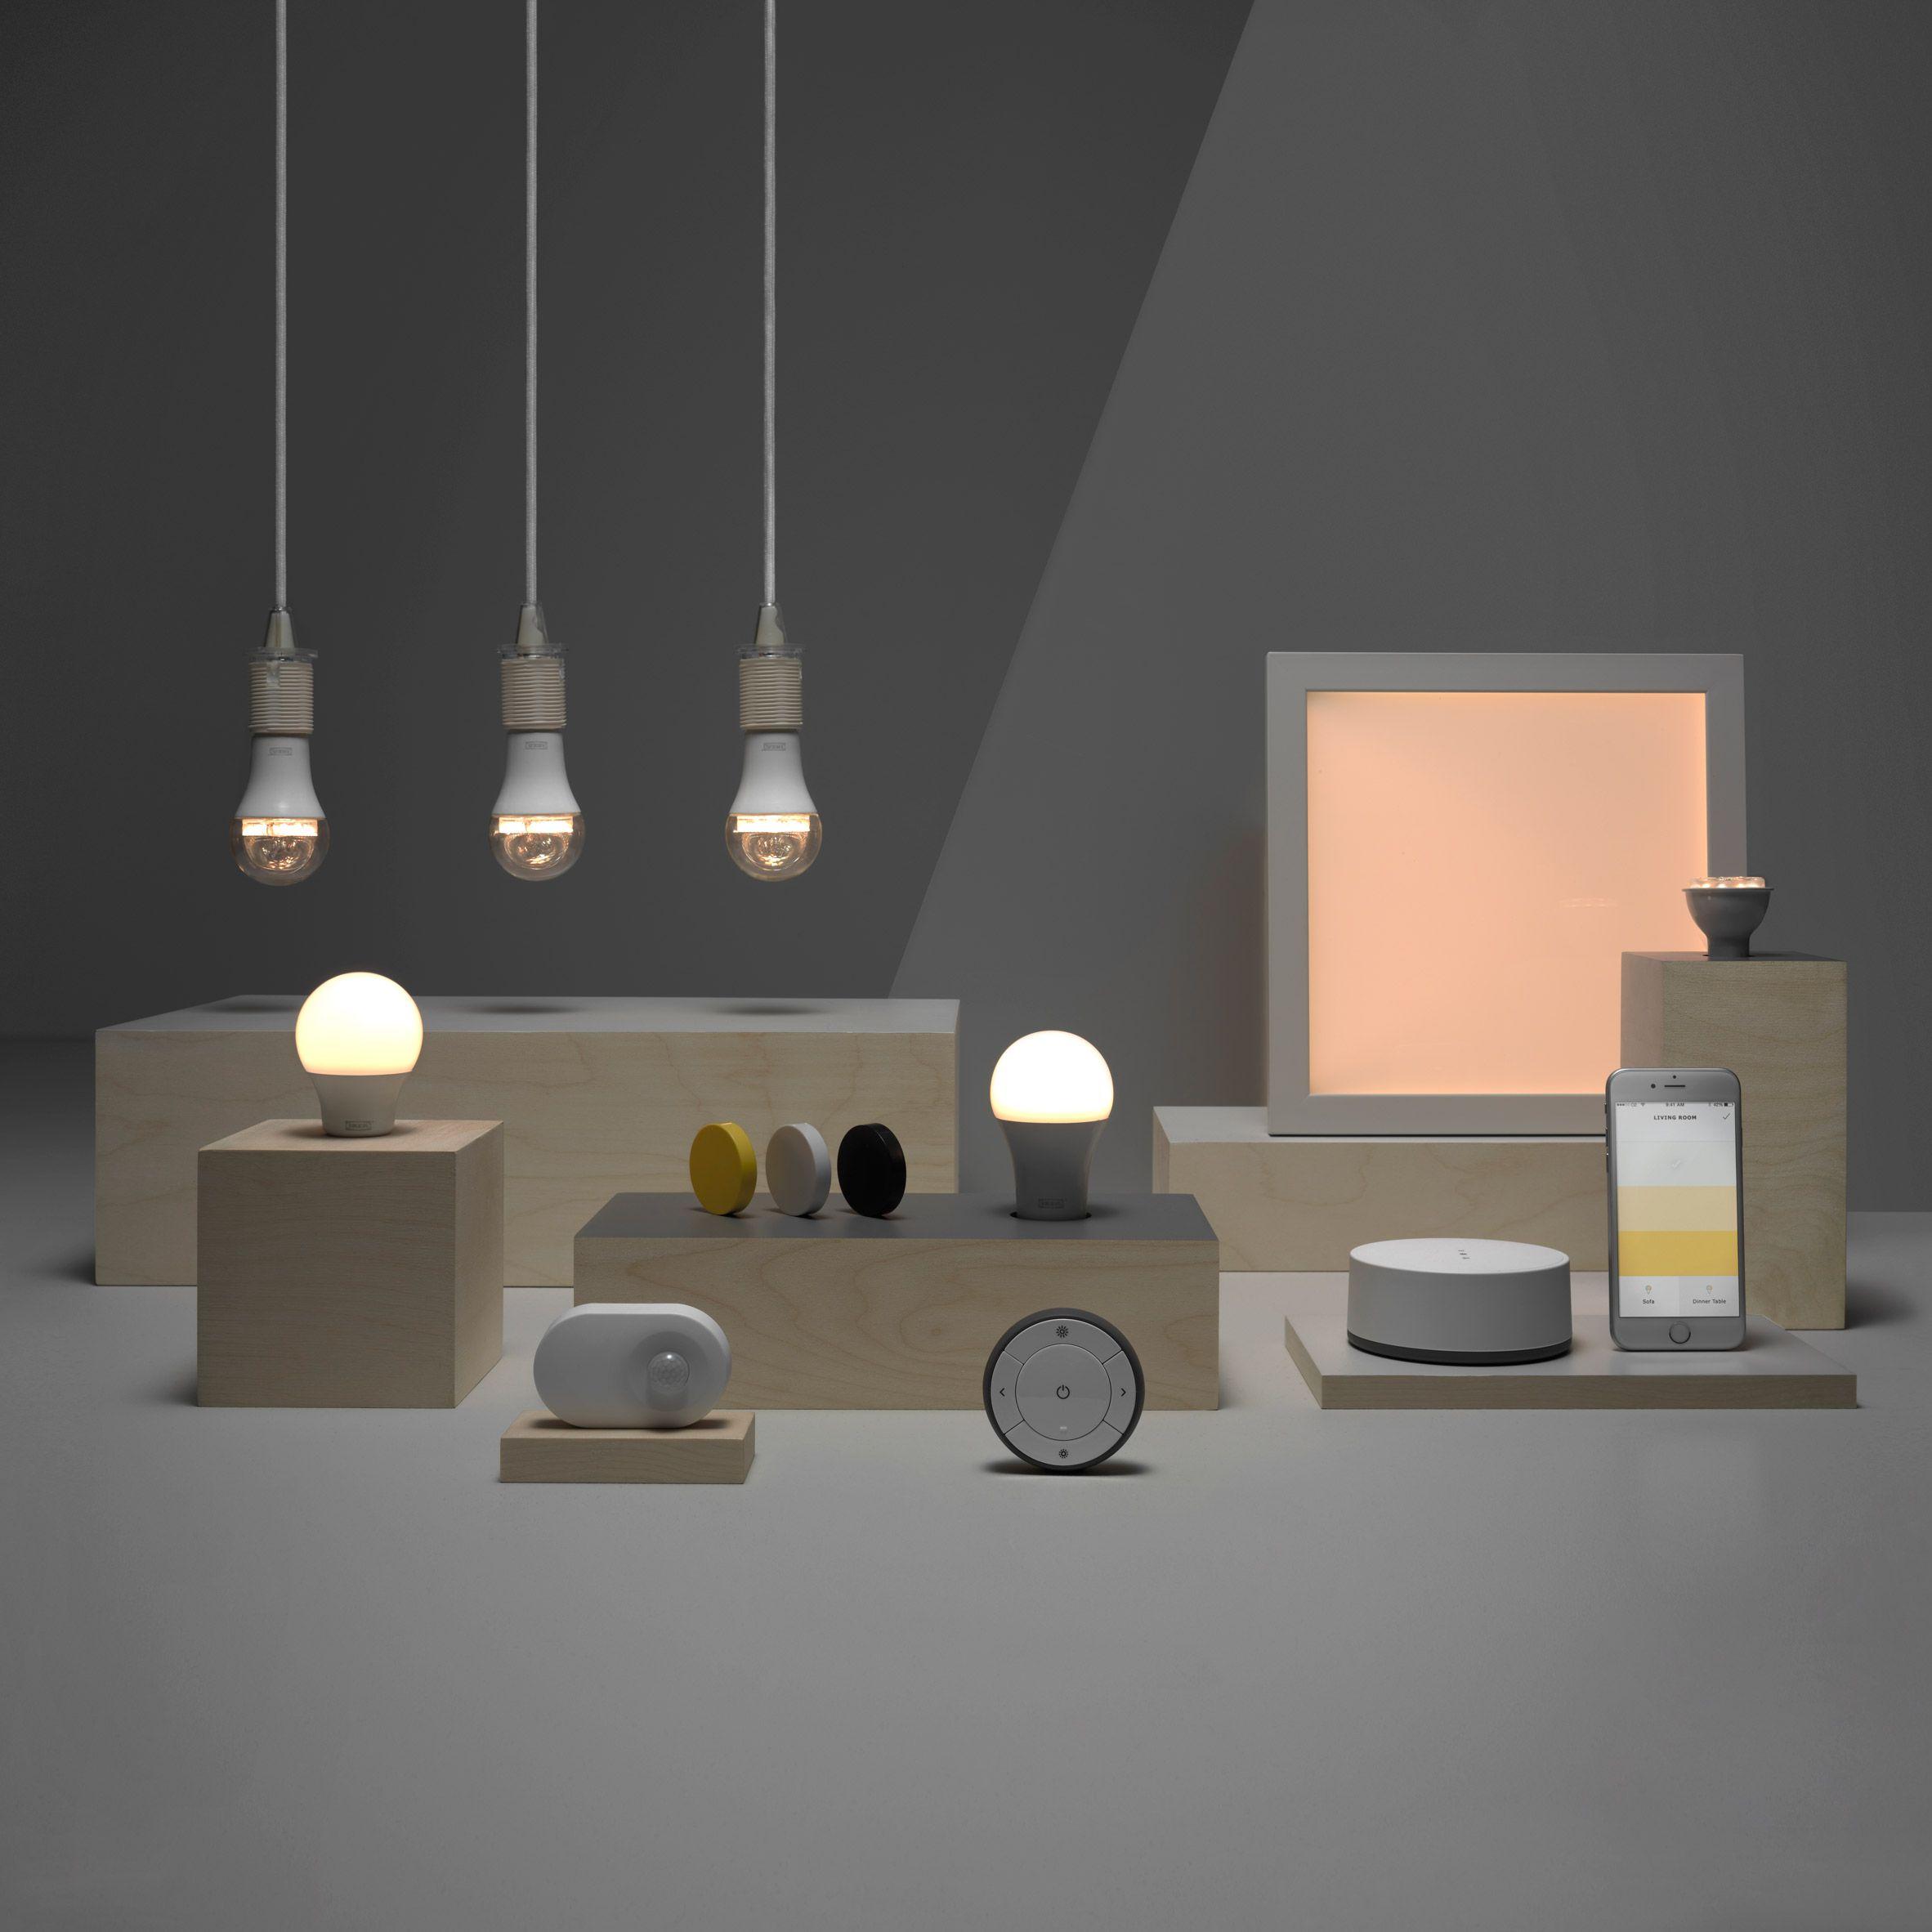 Ikea Slimme Verlichting Huisverlichting Verlichting Slim Huis